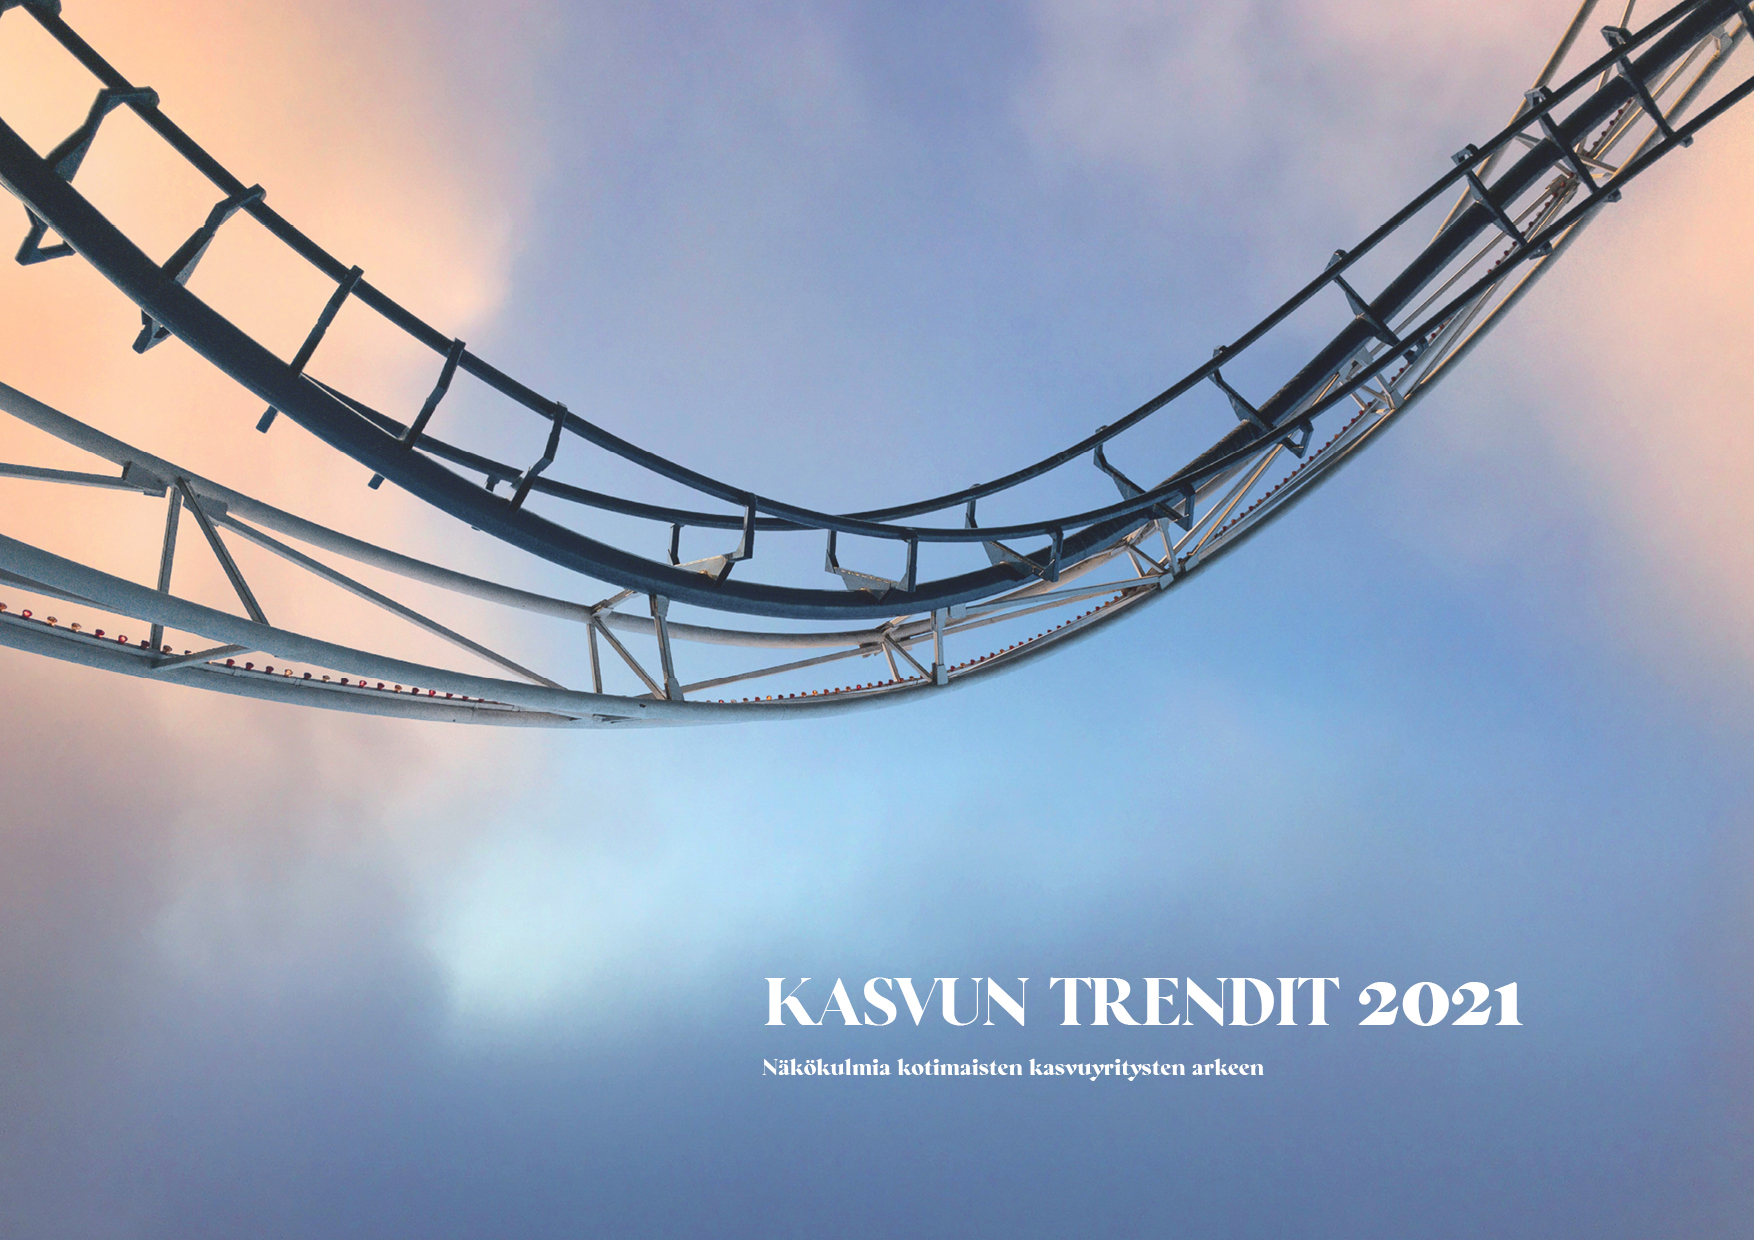 Kasvun trendit 2021